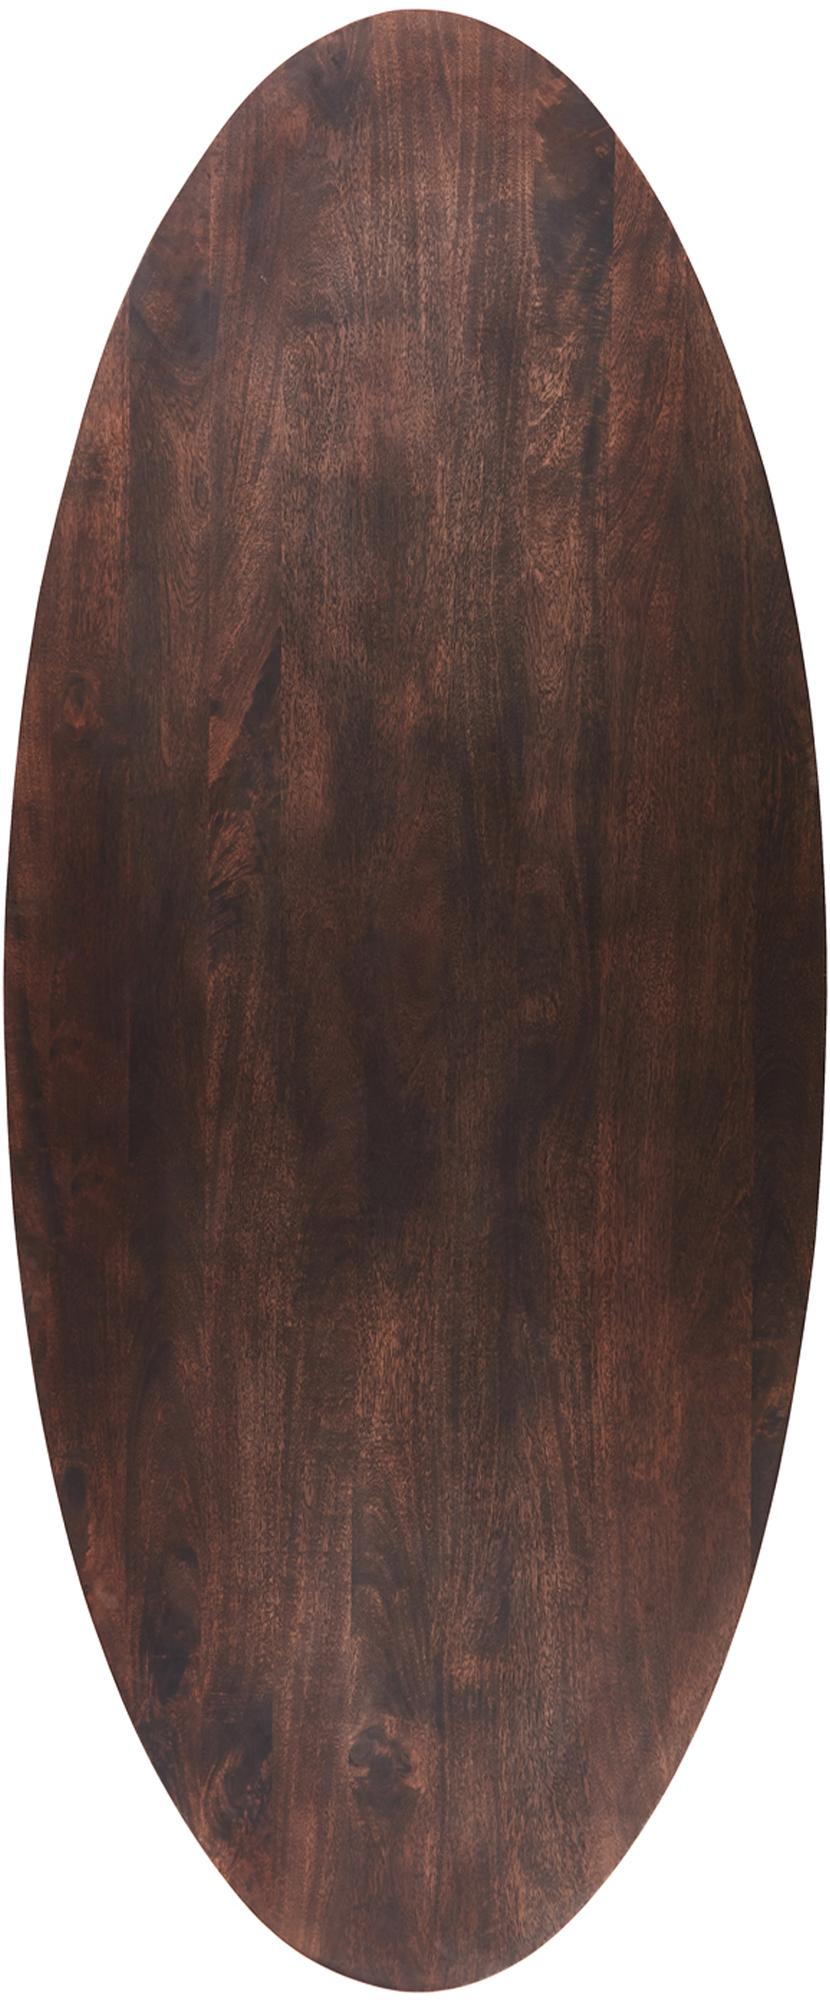 Mesa de comedor de madera maciza Luca, Tablero: madera de mango maciza pi, Estructura: metal recubierto, Madera oscura, dorado, An 240 x F 100 cm